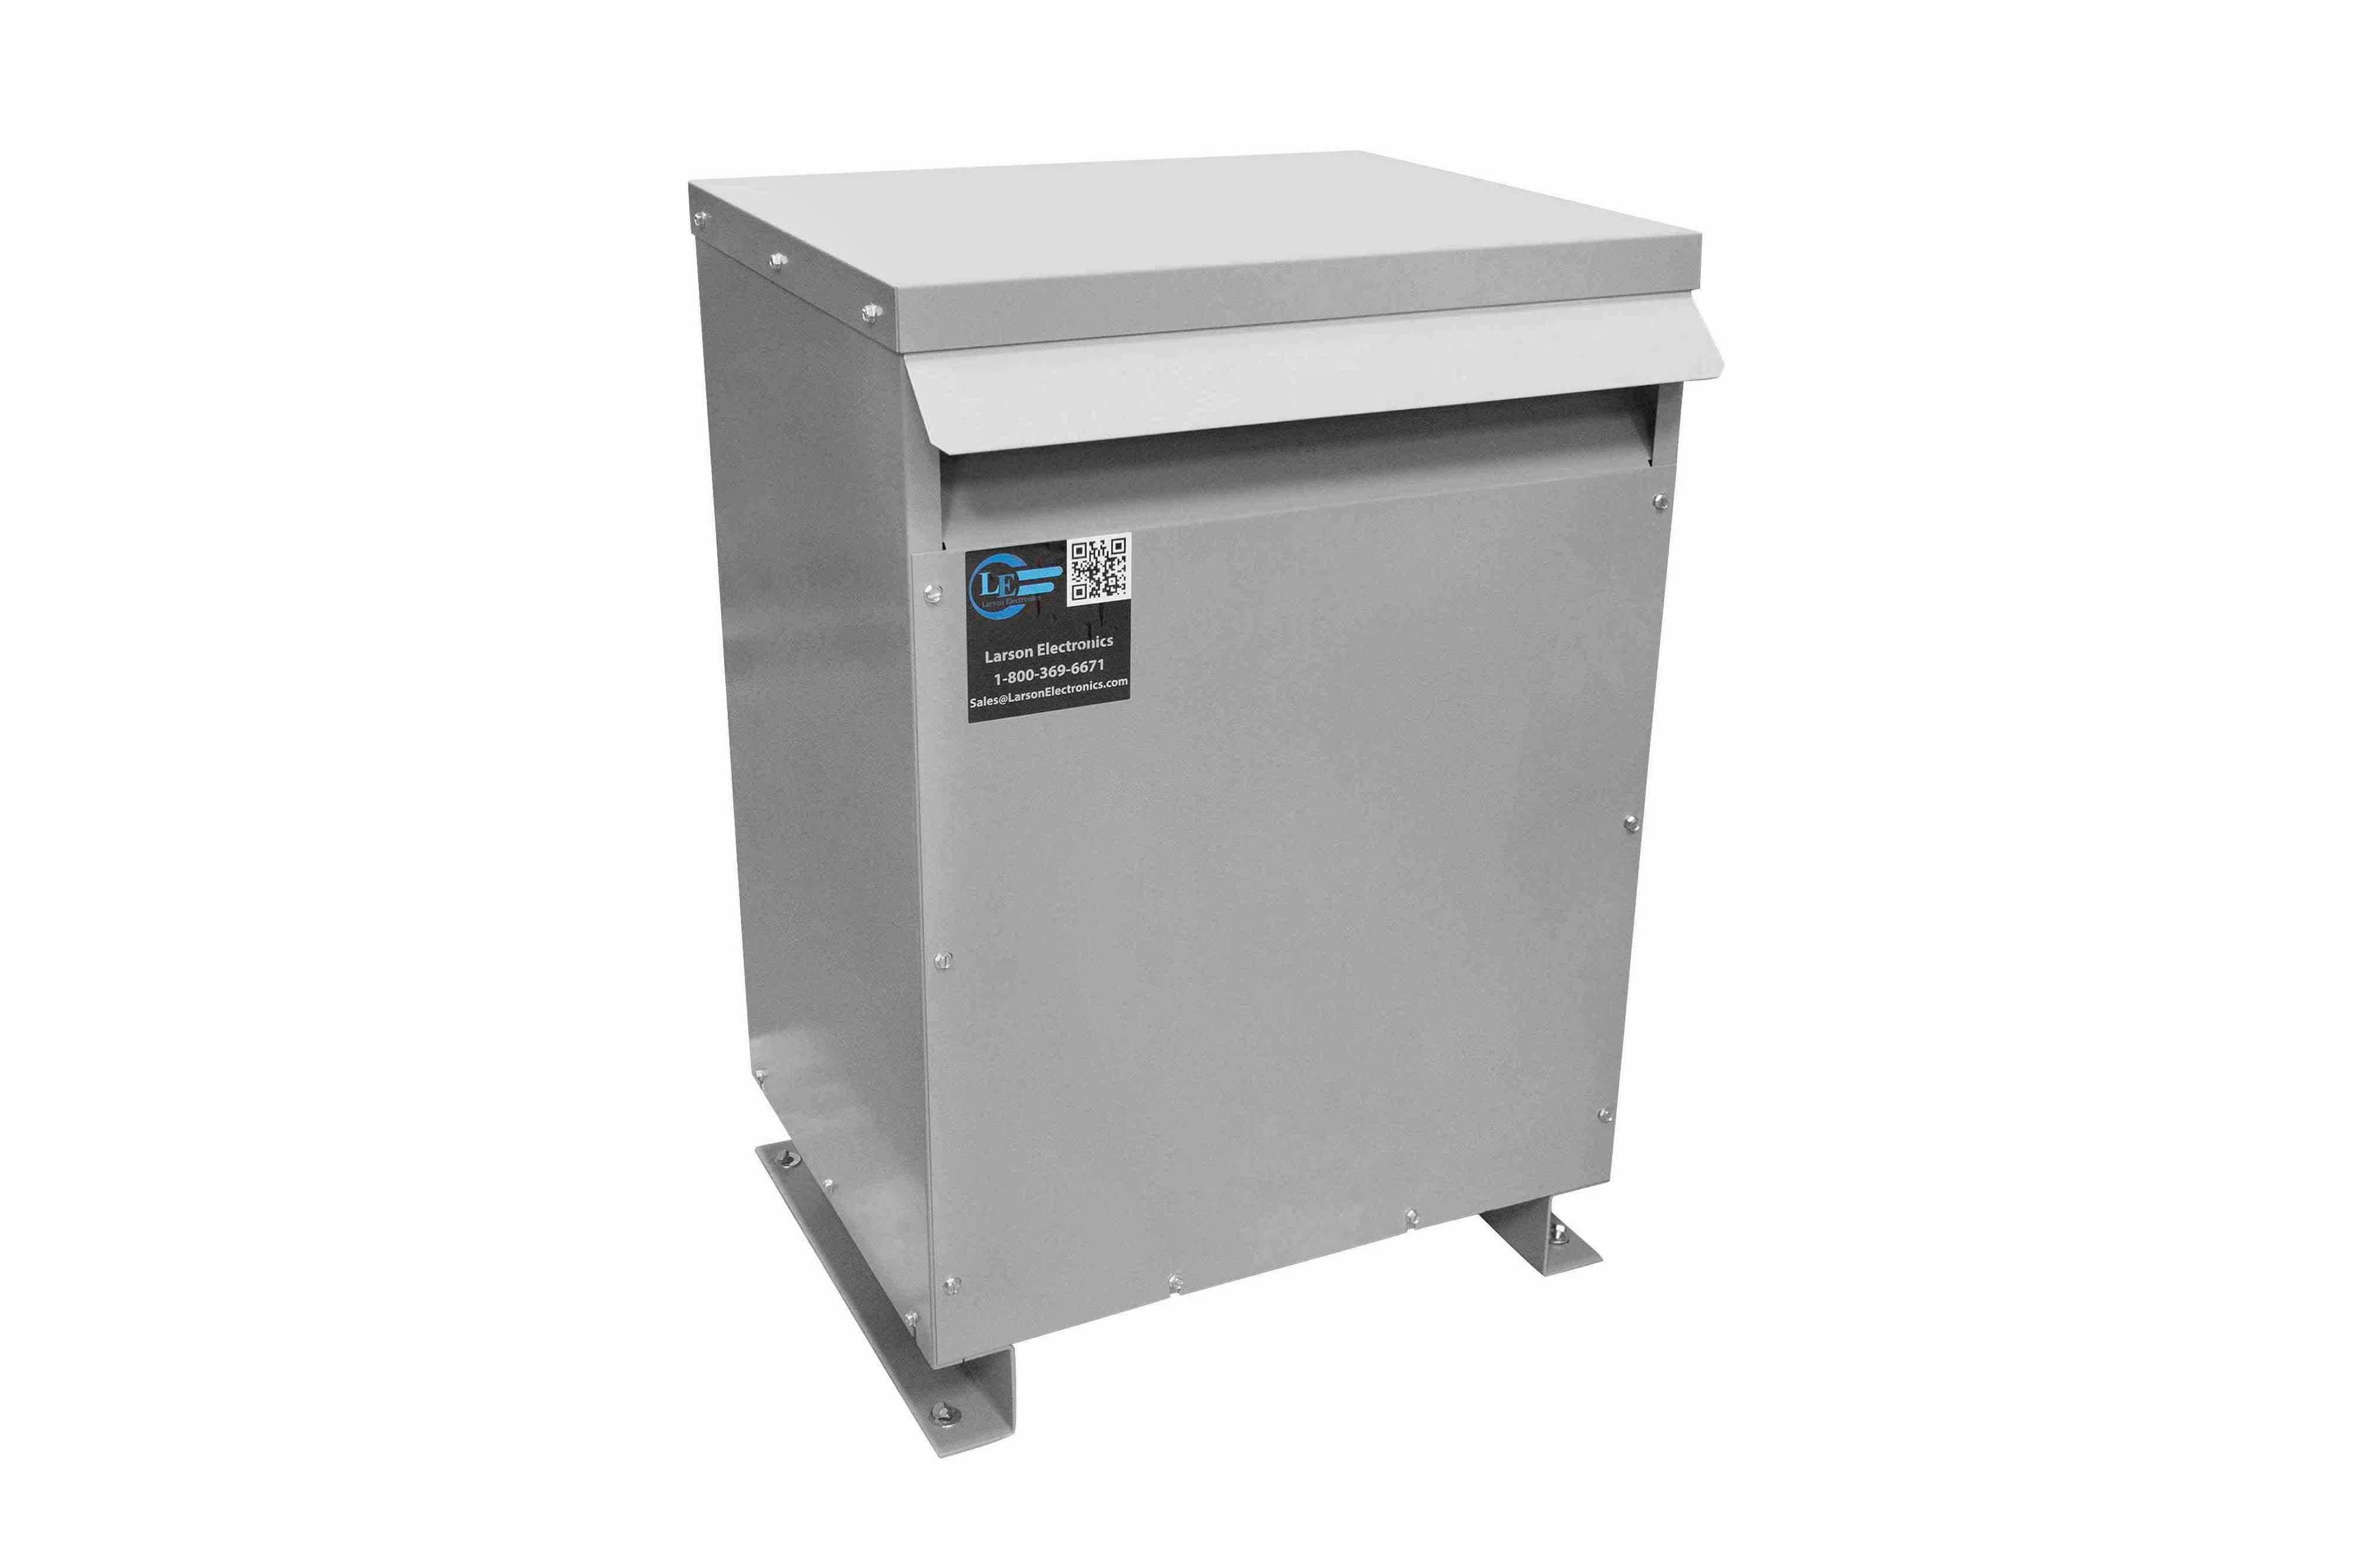 29 kVA 3PH Isolation Transformer, 575V Wye Primary, 240V/120 Delta Secondary, N3R, Ventilated, 60 Hz